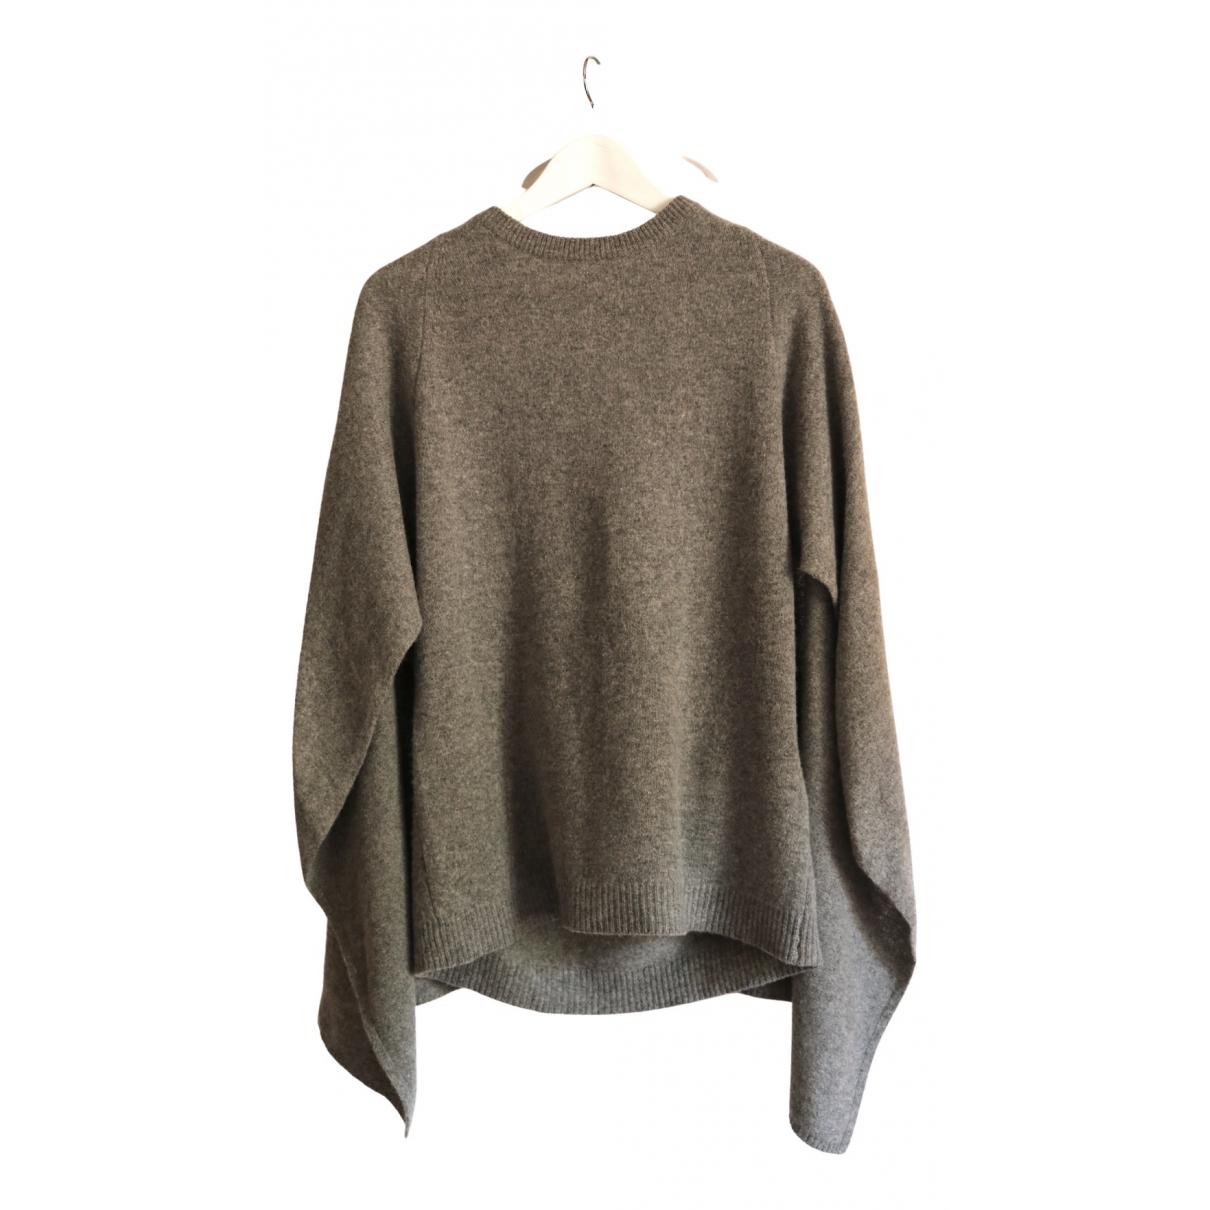 Sandro - Pull Fall Winter 2019 pour femme en laine - gris